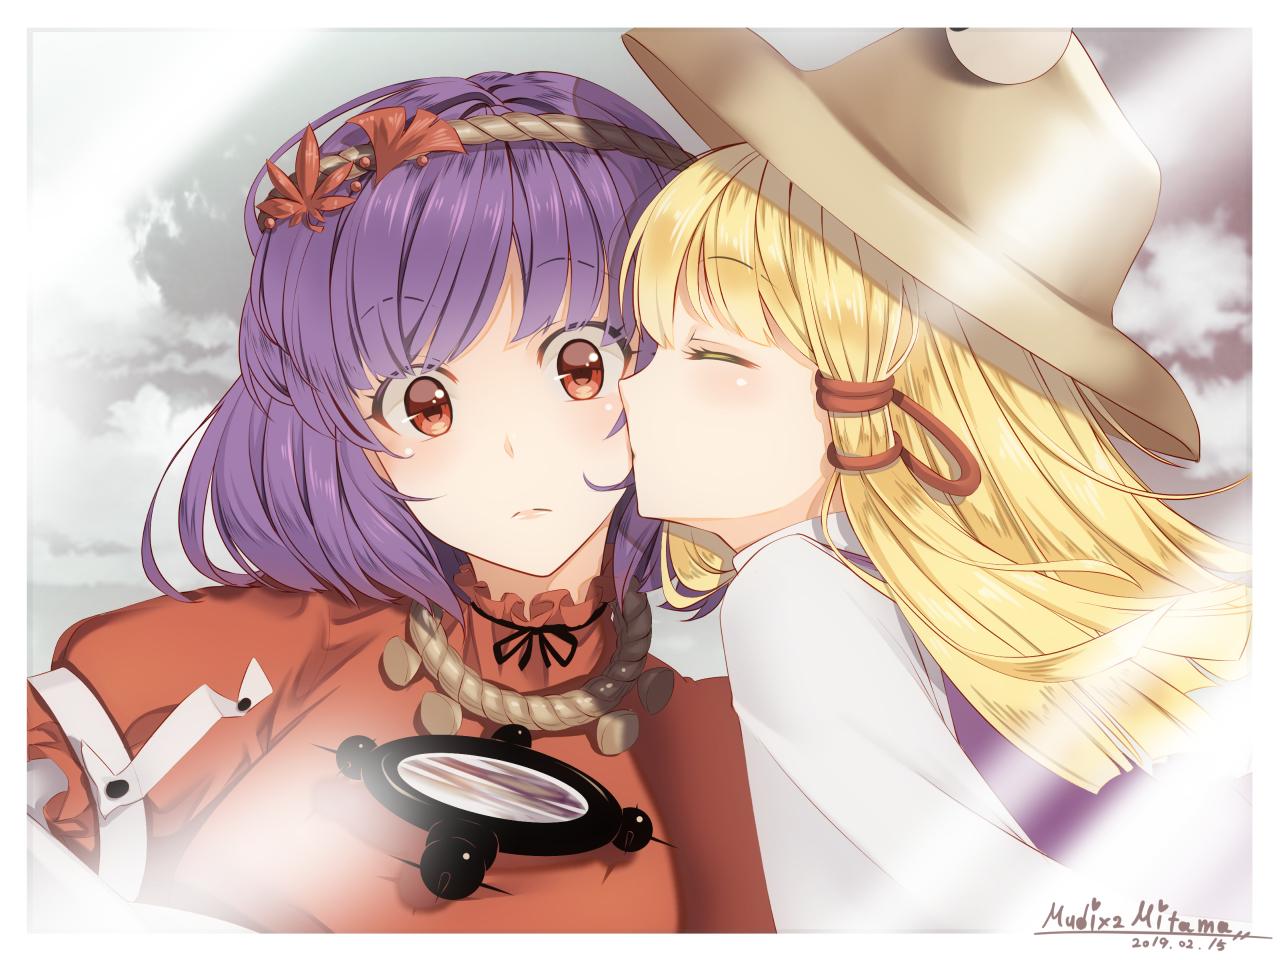 aliasing blonde_hair hat kiss long_hair mirror moriya_suwako mudix2 purple_hair red_eyes short_hair shoujo_ai signed touhou yasaka_kanako